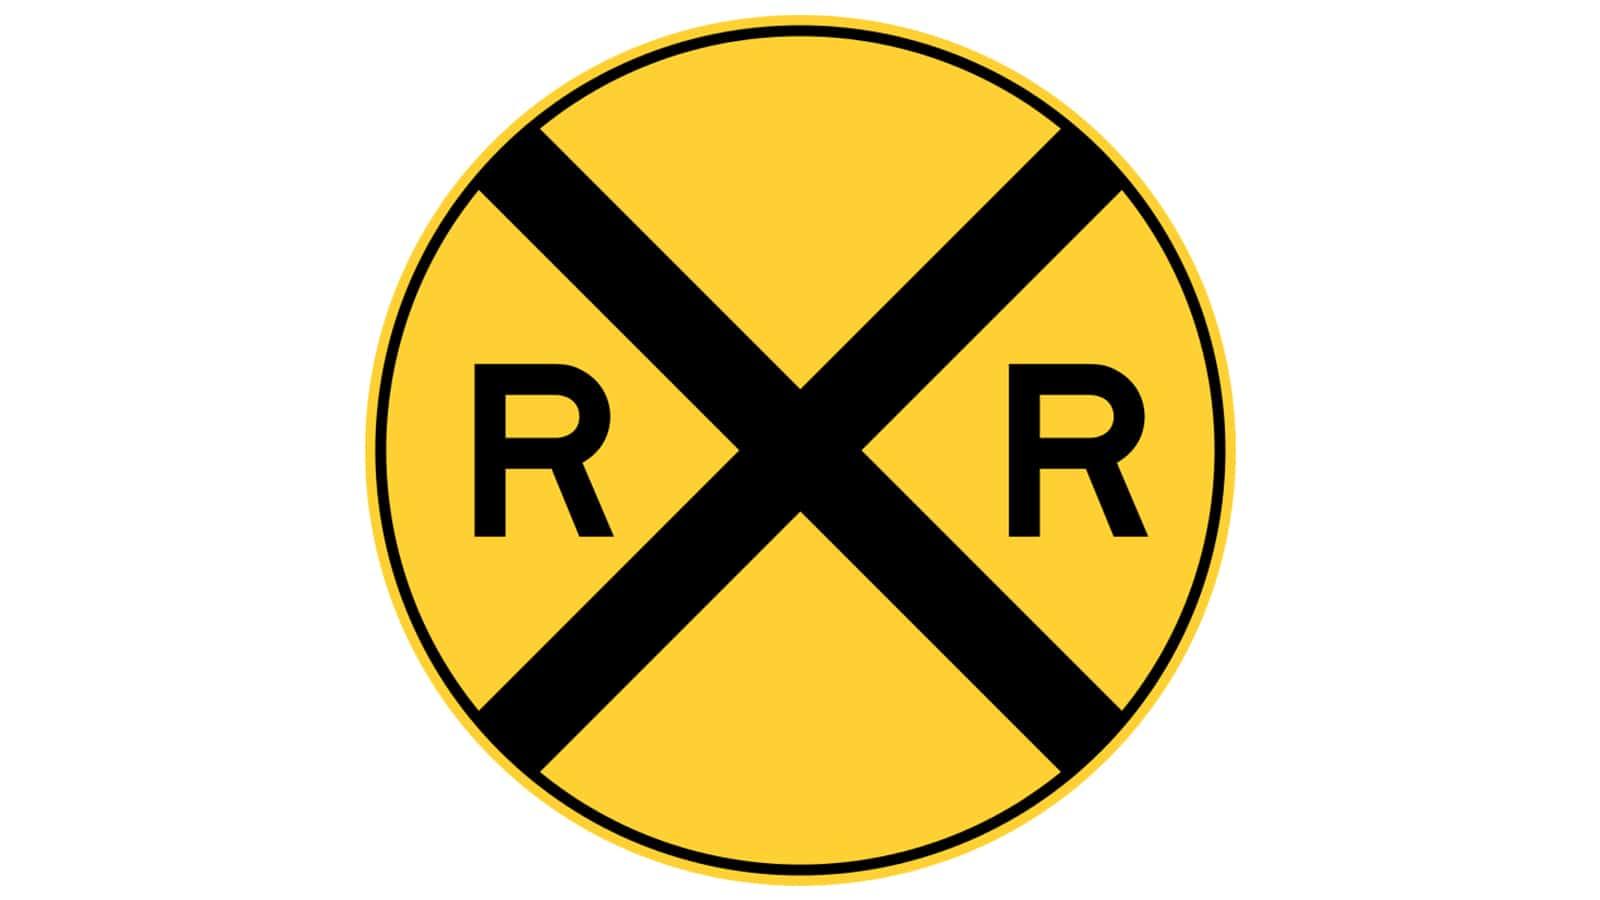 warning sign Railroad Crossing Ahead